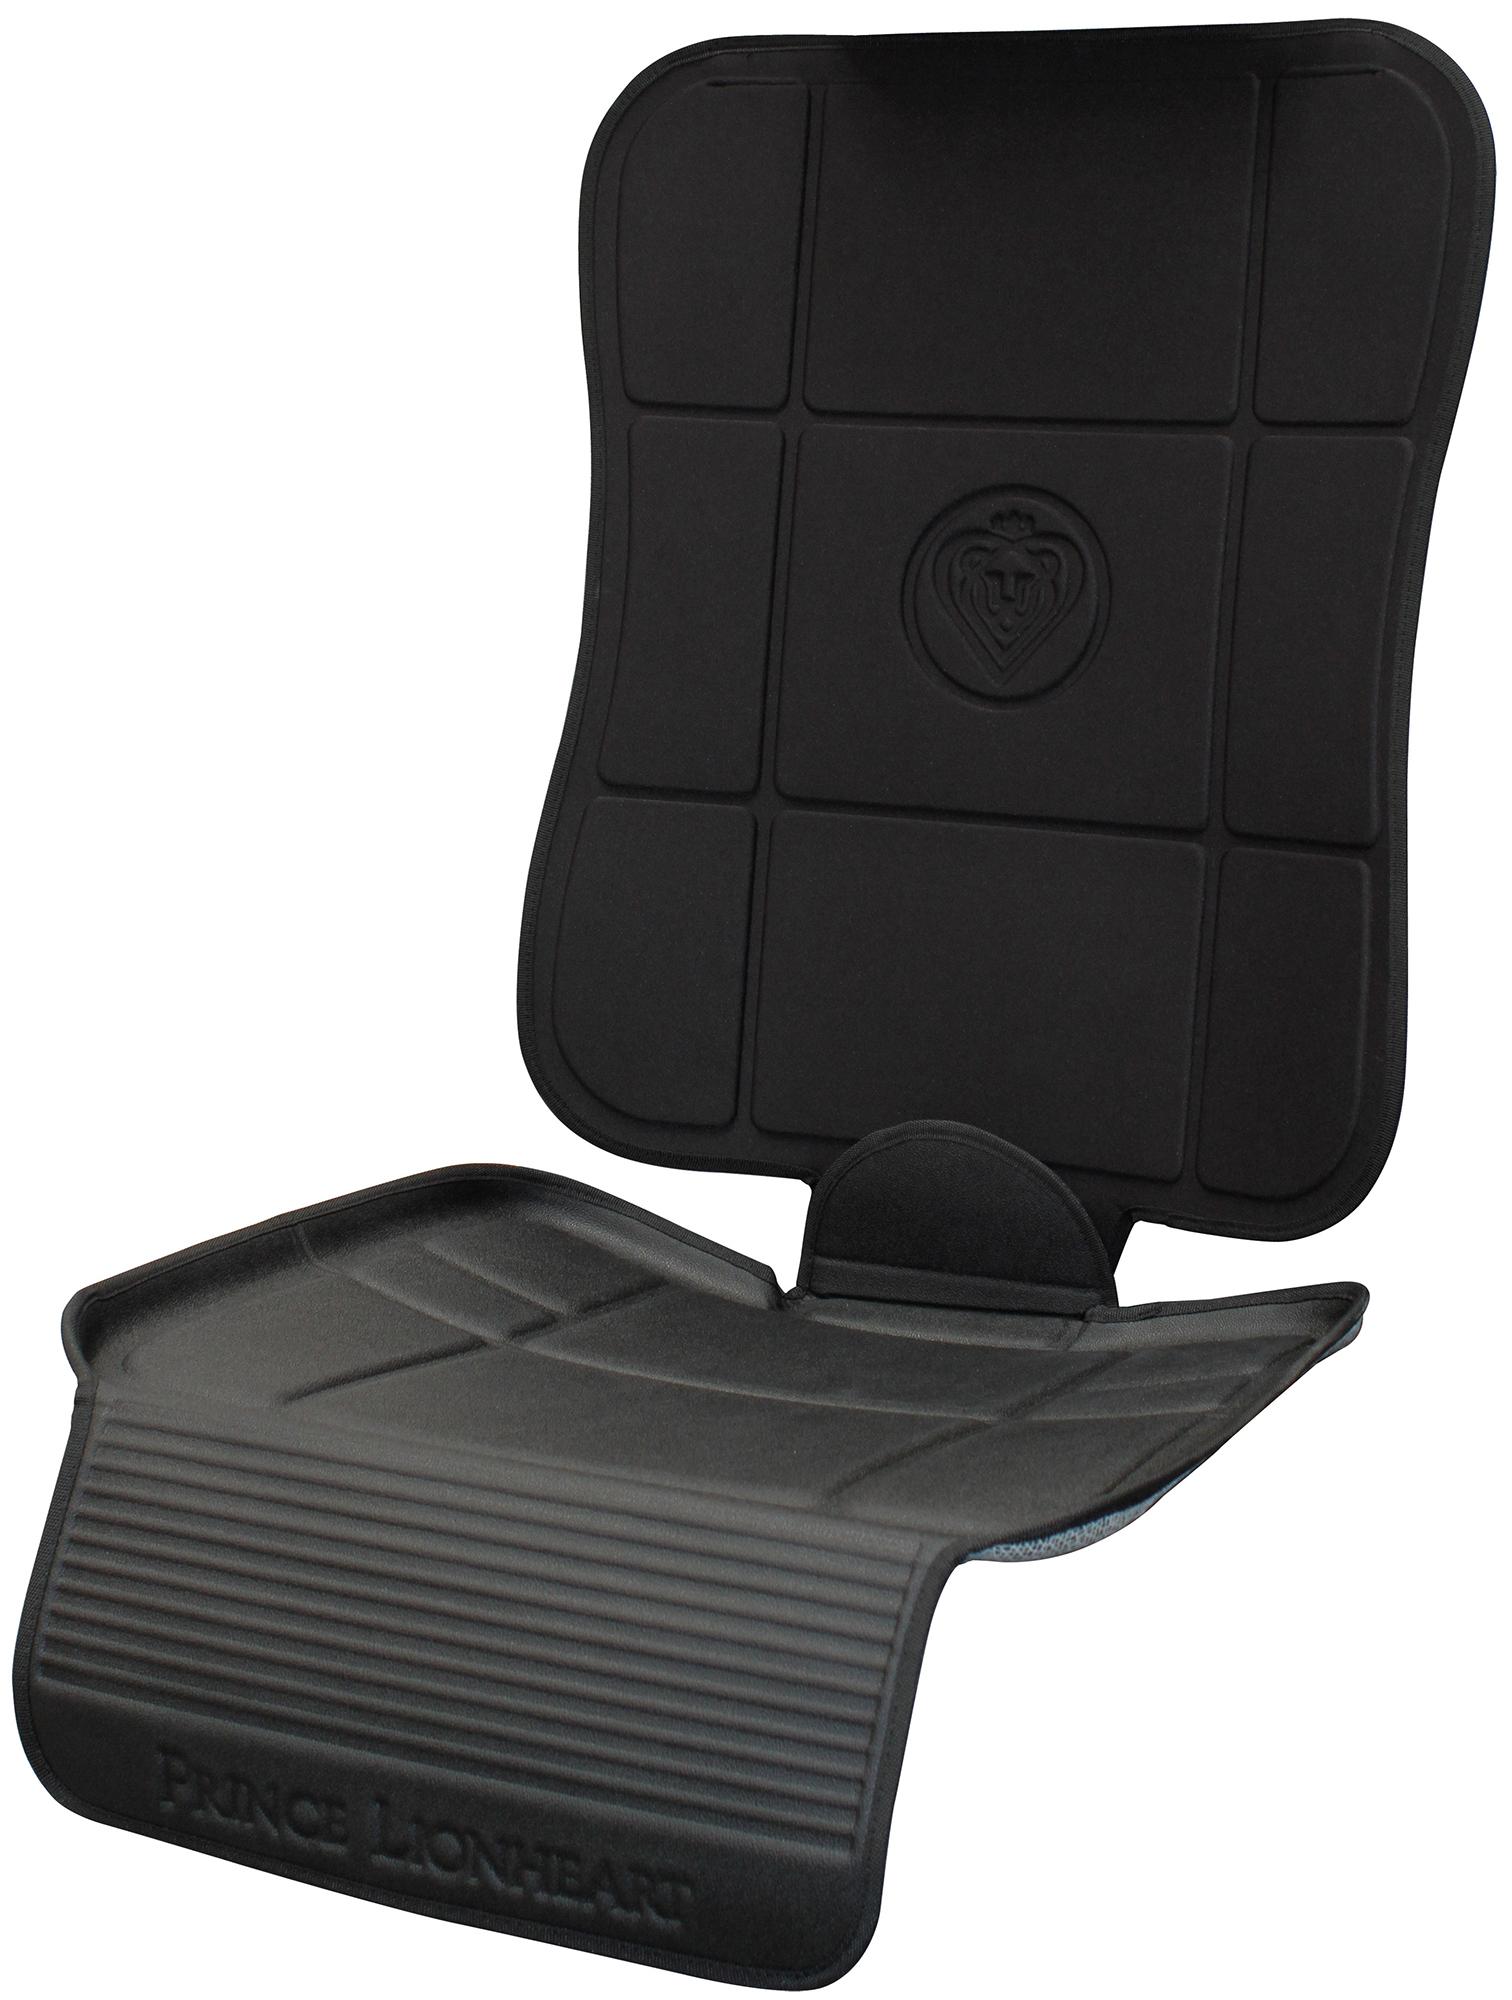 prince lionheart 2 stage seat saver isofix compatible car seat accessory bn ebay. Black Bedroom Furniture Sets. Home Design Ideas